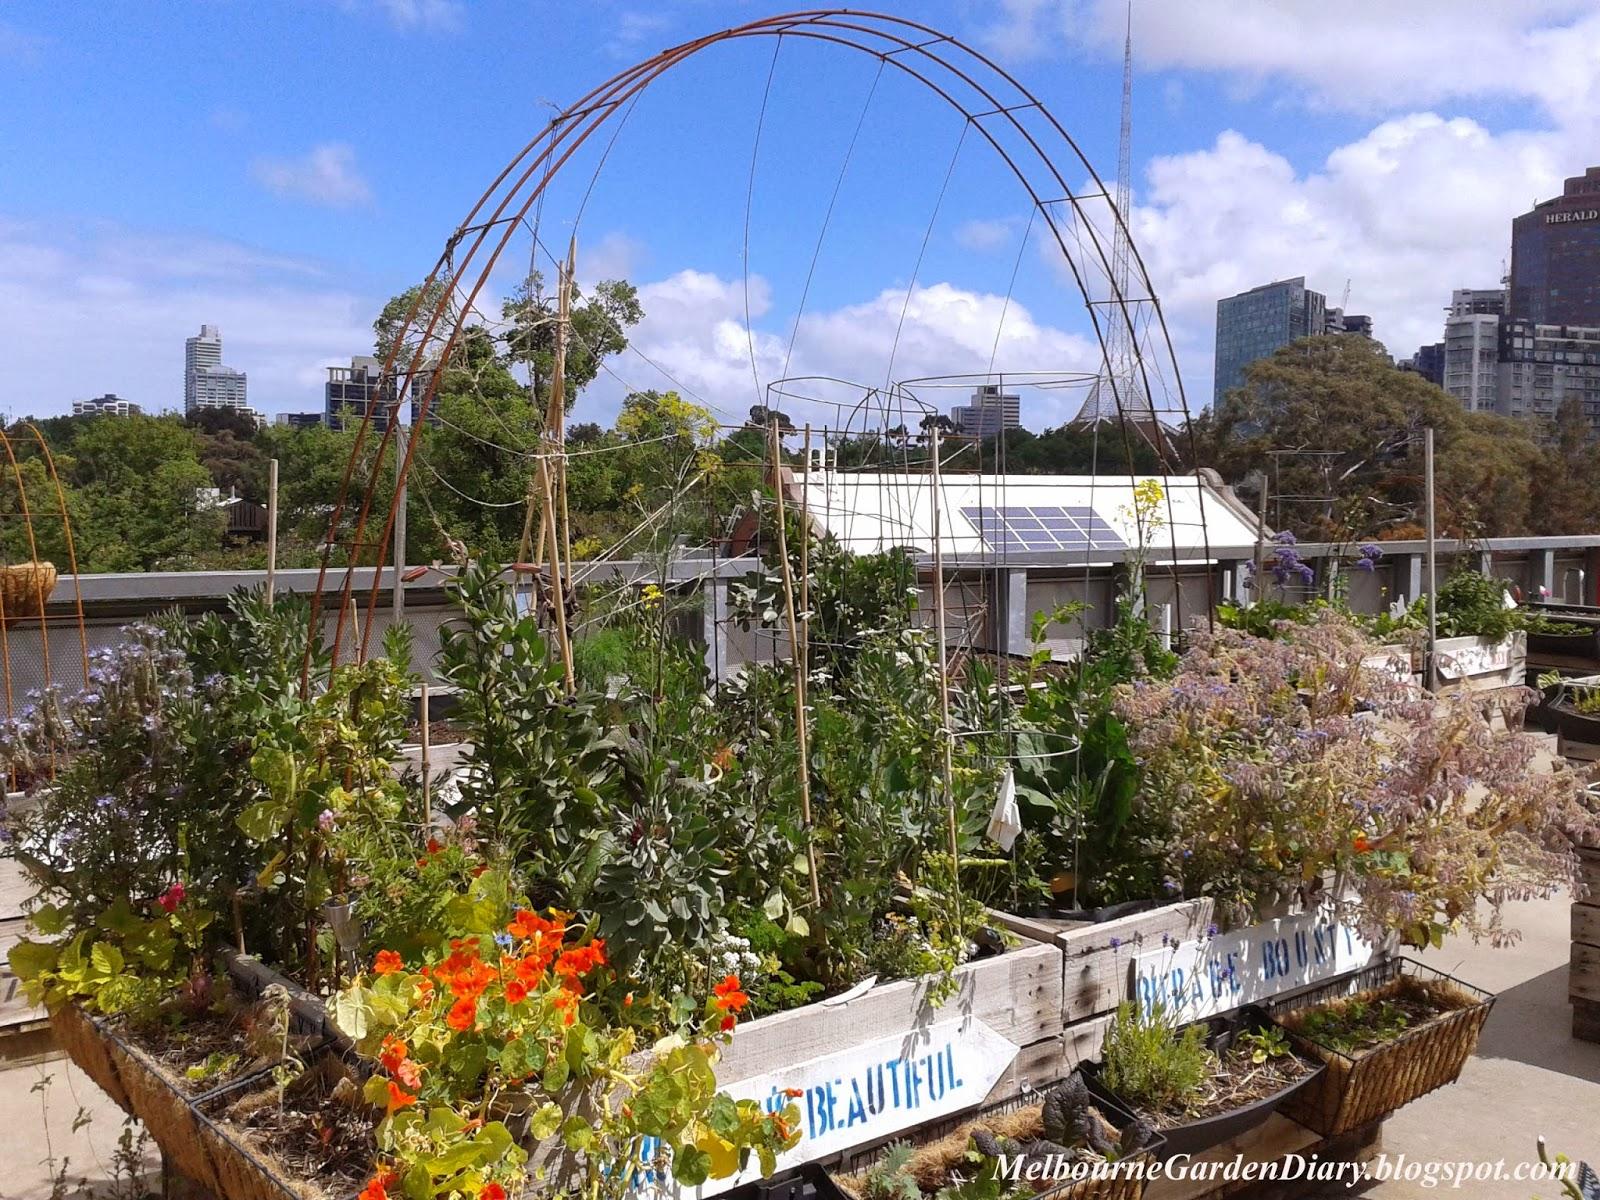 Melbourne Garden Diary: Pop Up Patch